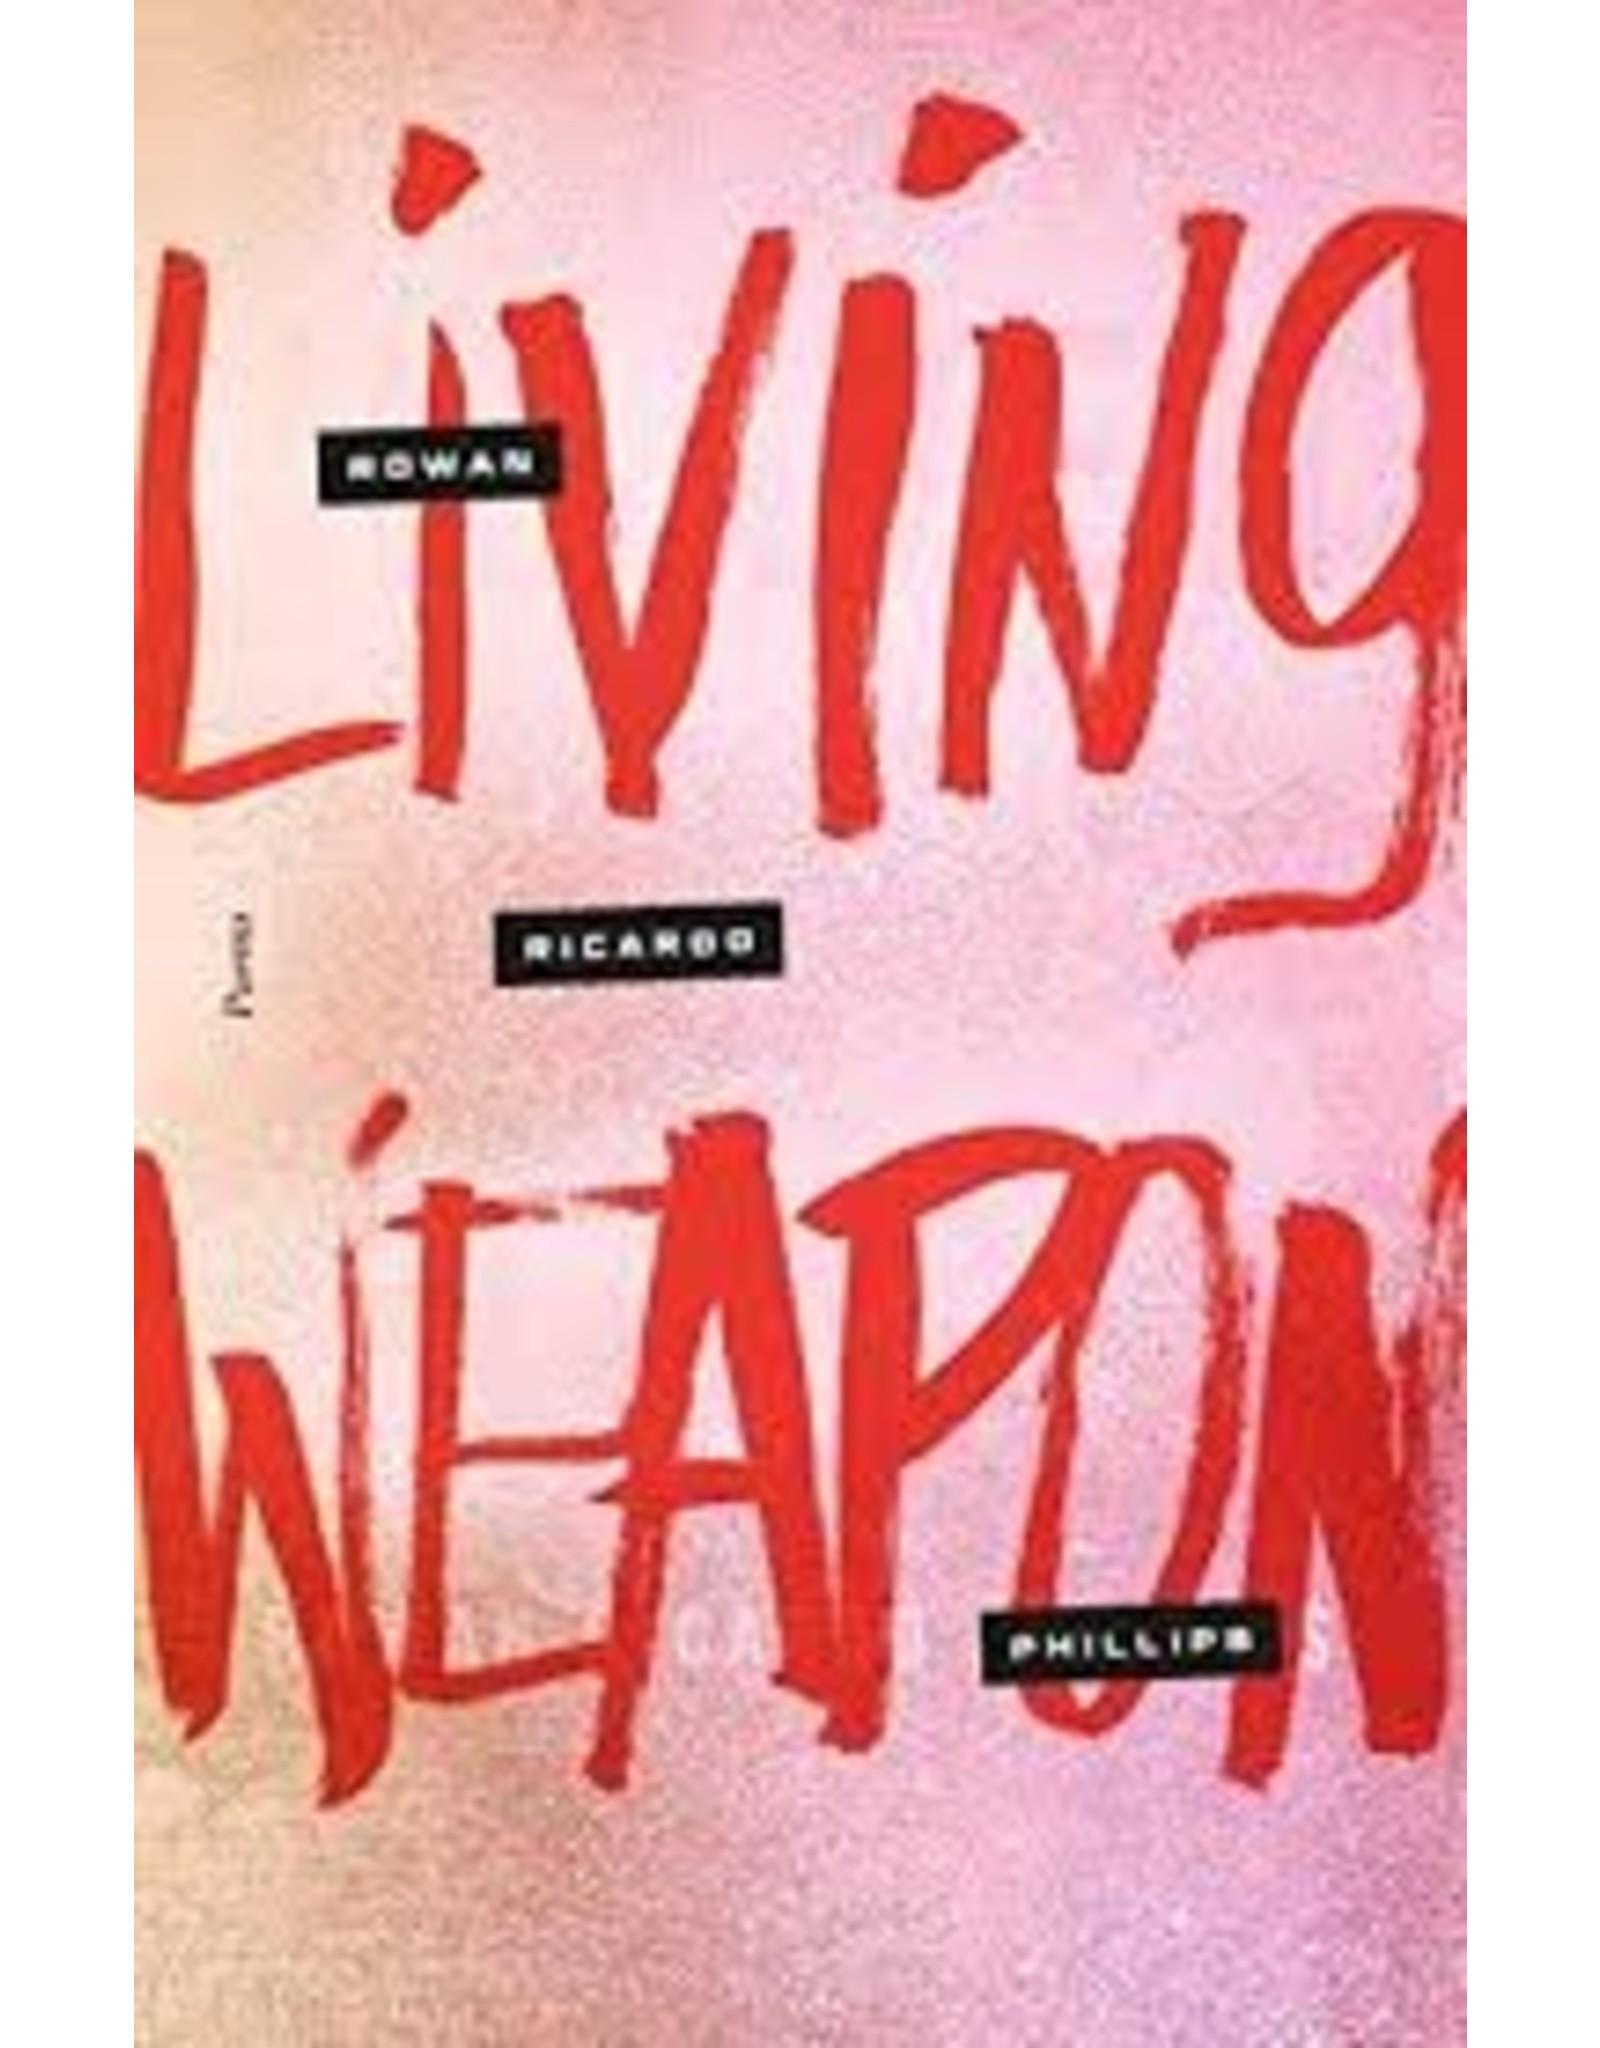 Books Living Weapon by Rowan Richardo Phillips